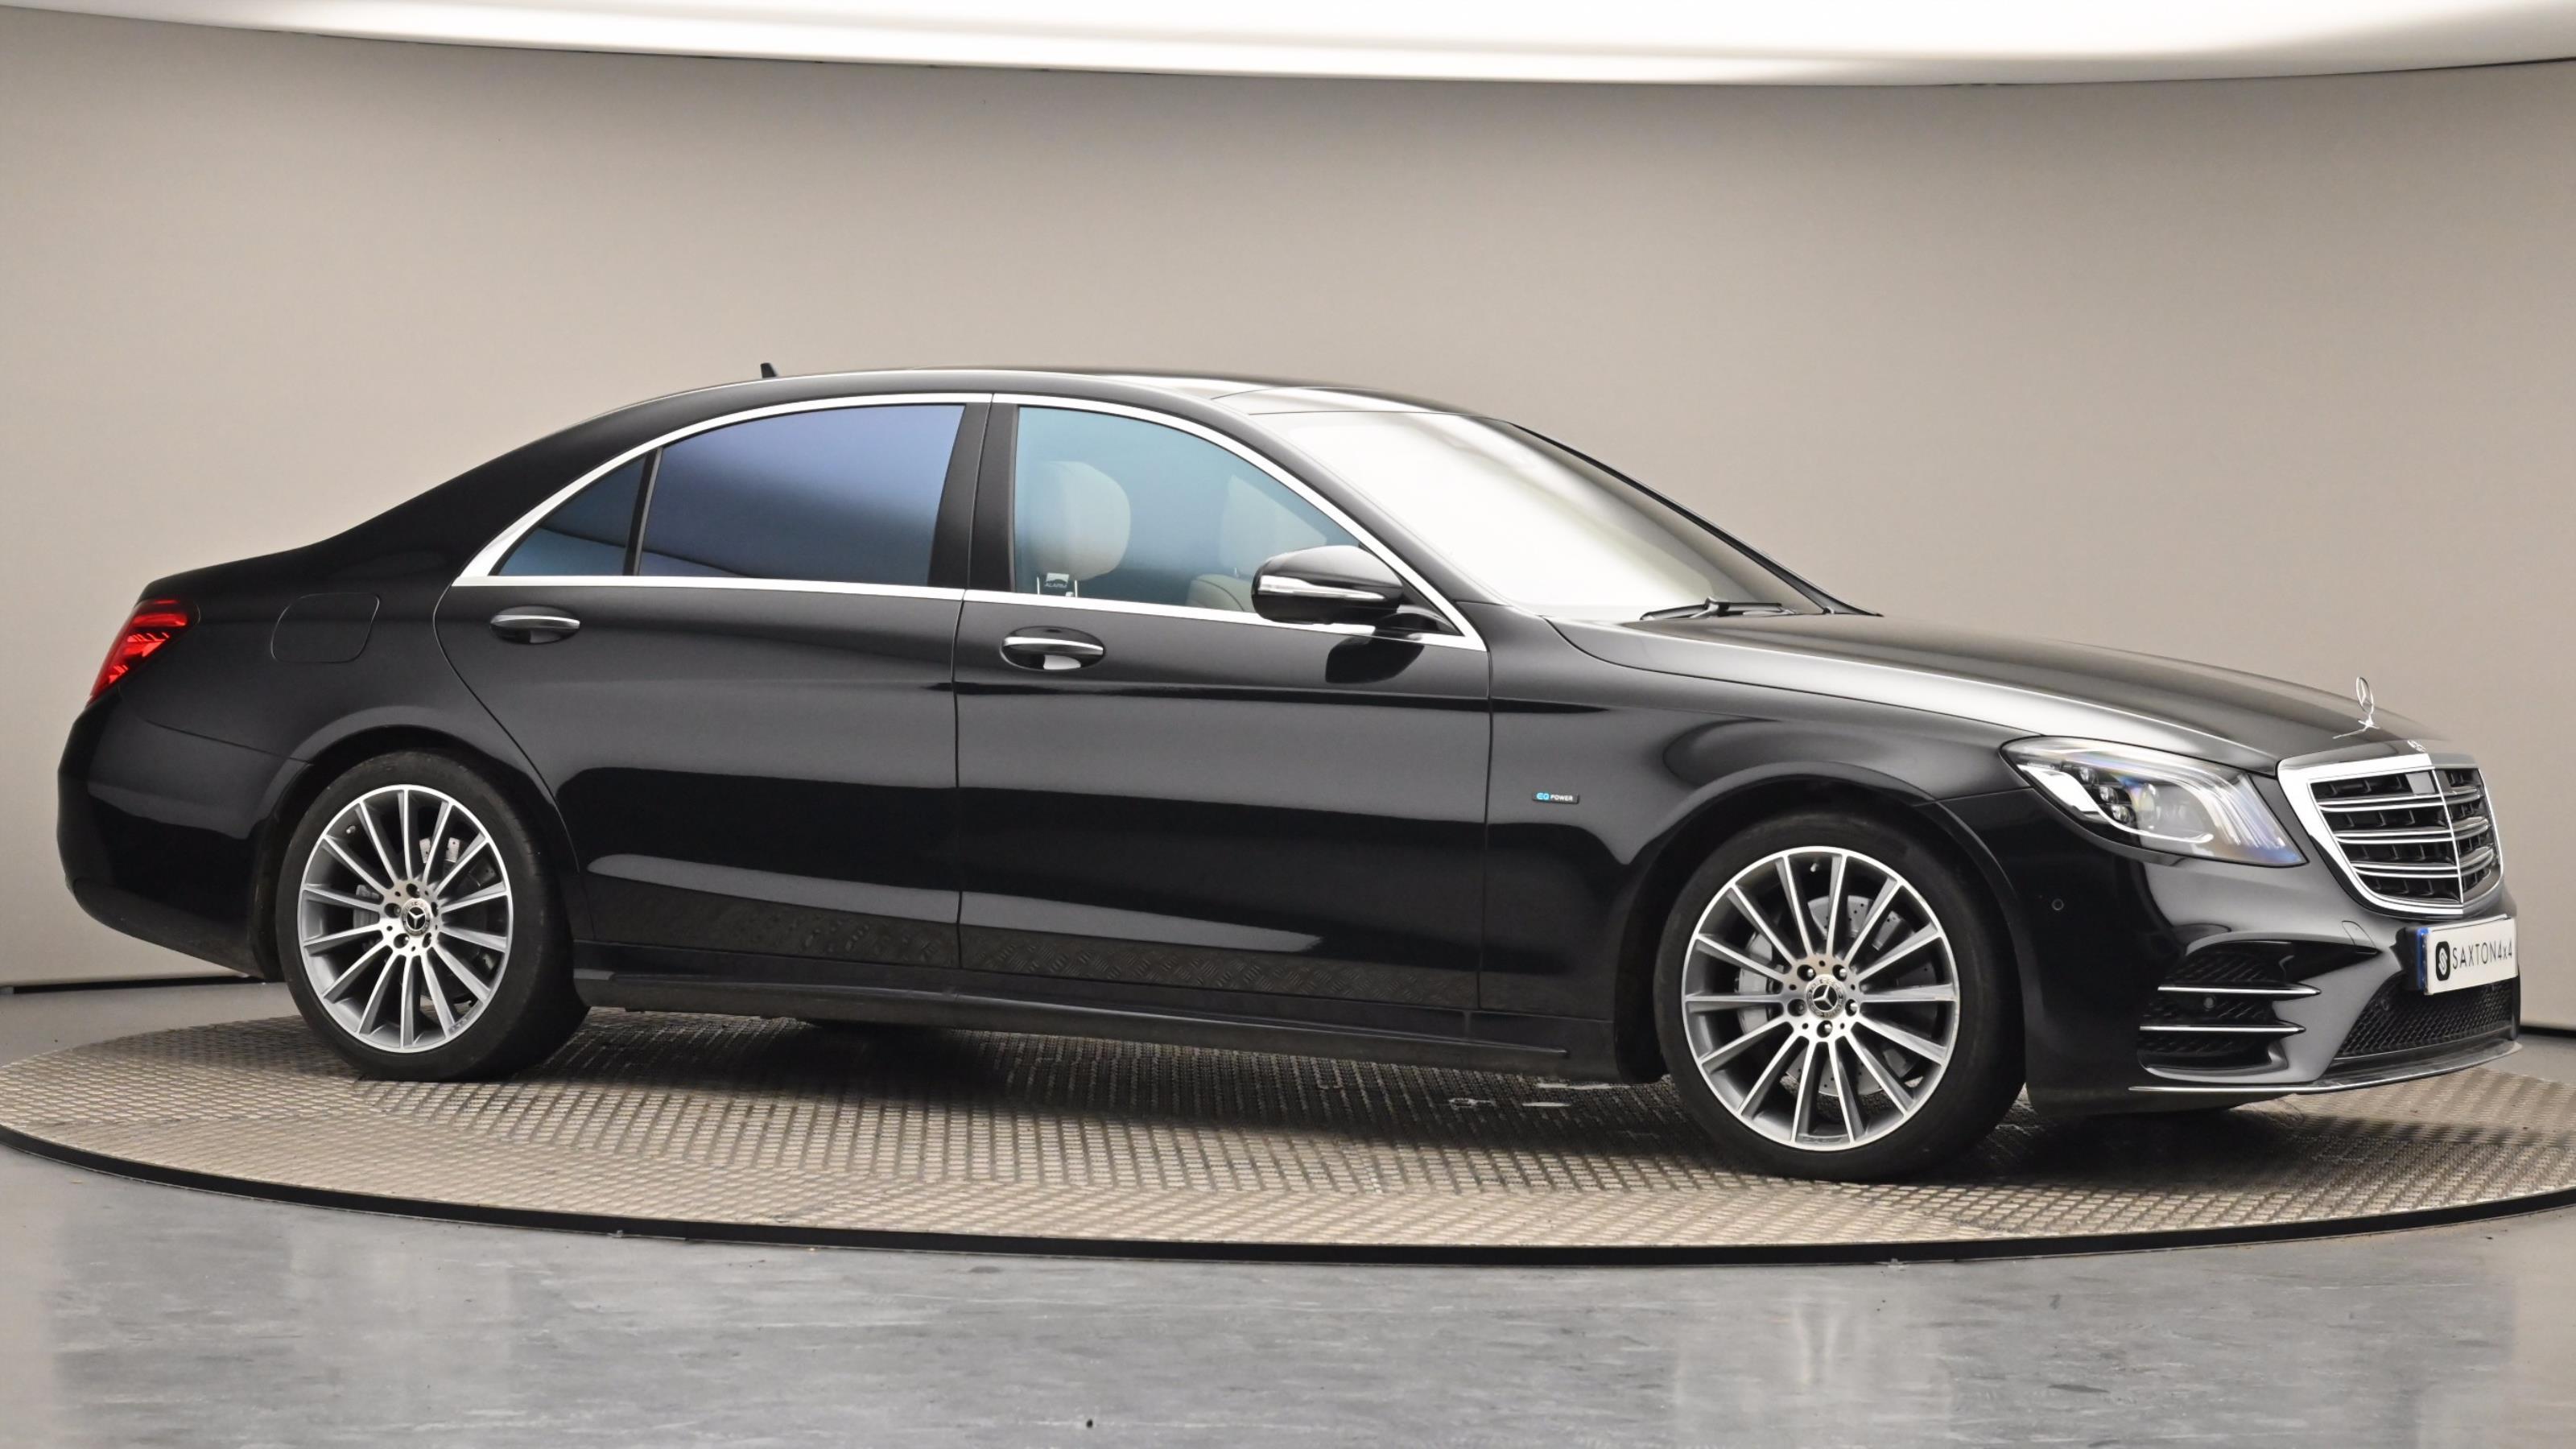 Used 2019 Mercedes-Benz S CLASS S560e L AMG Line Executive/Prem Plus 4dr 9G-Tronic Black at Saxton4x4